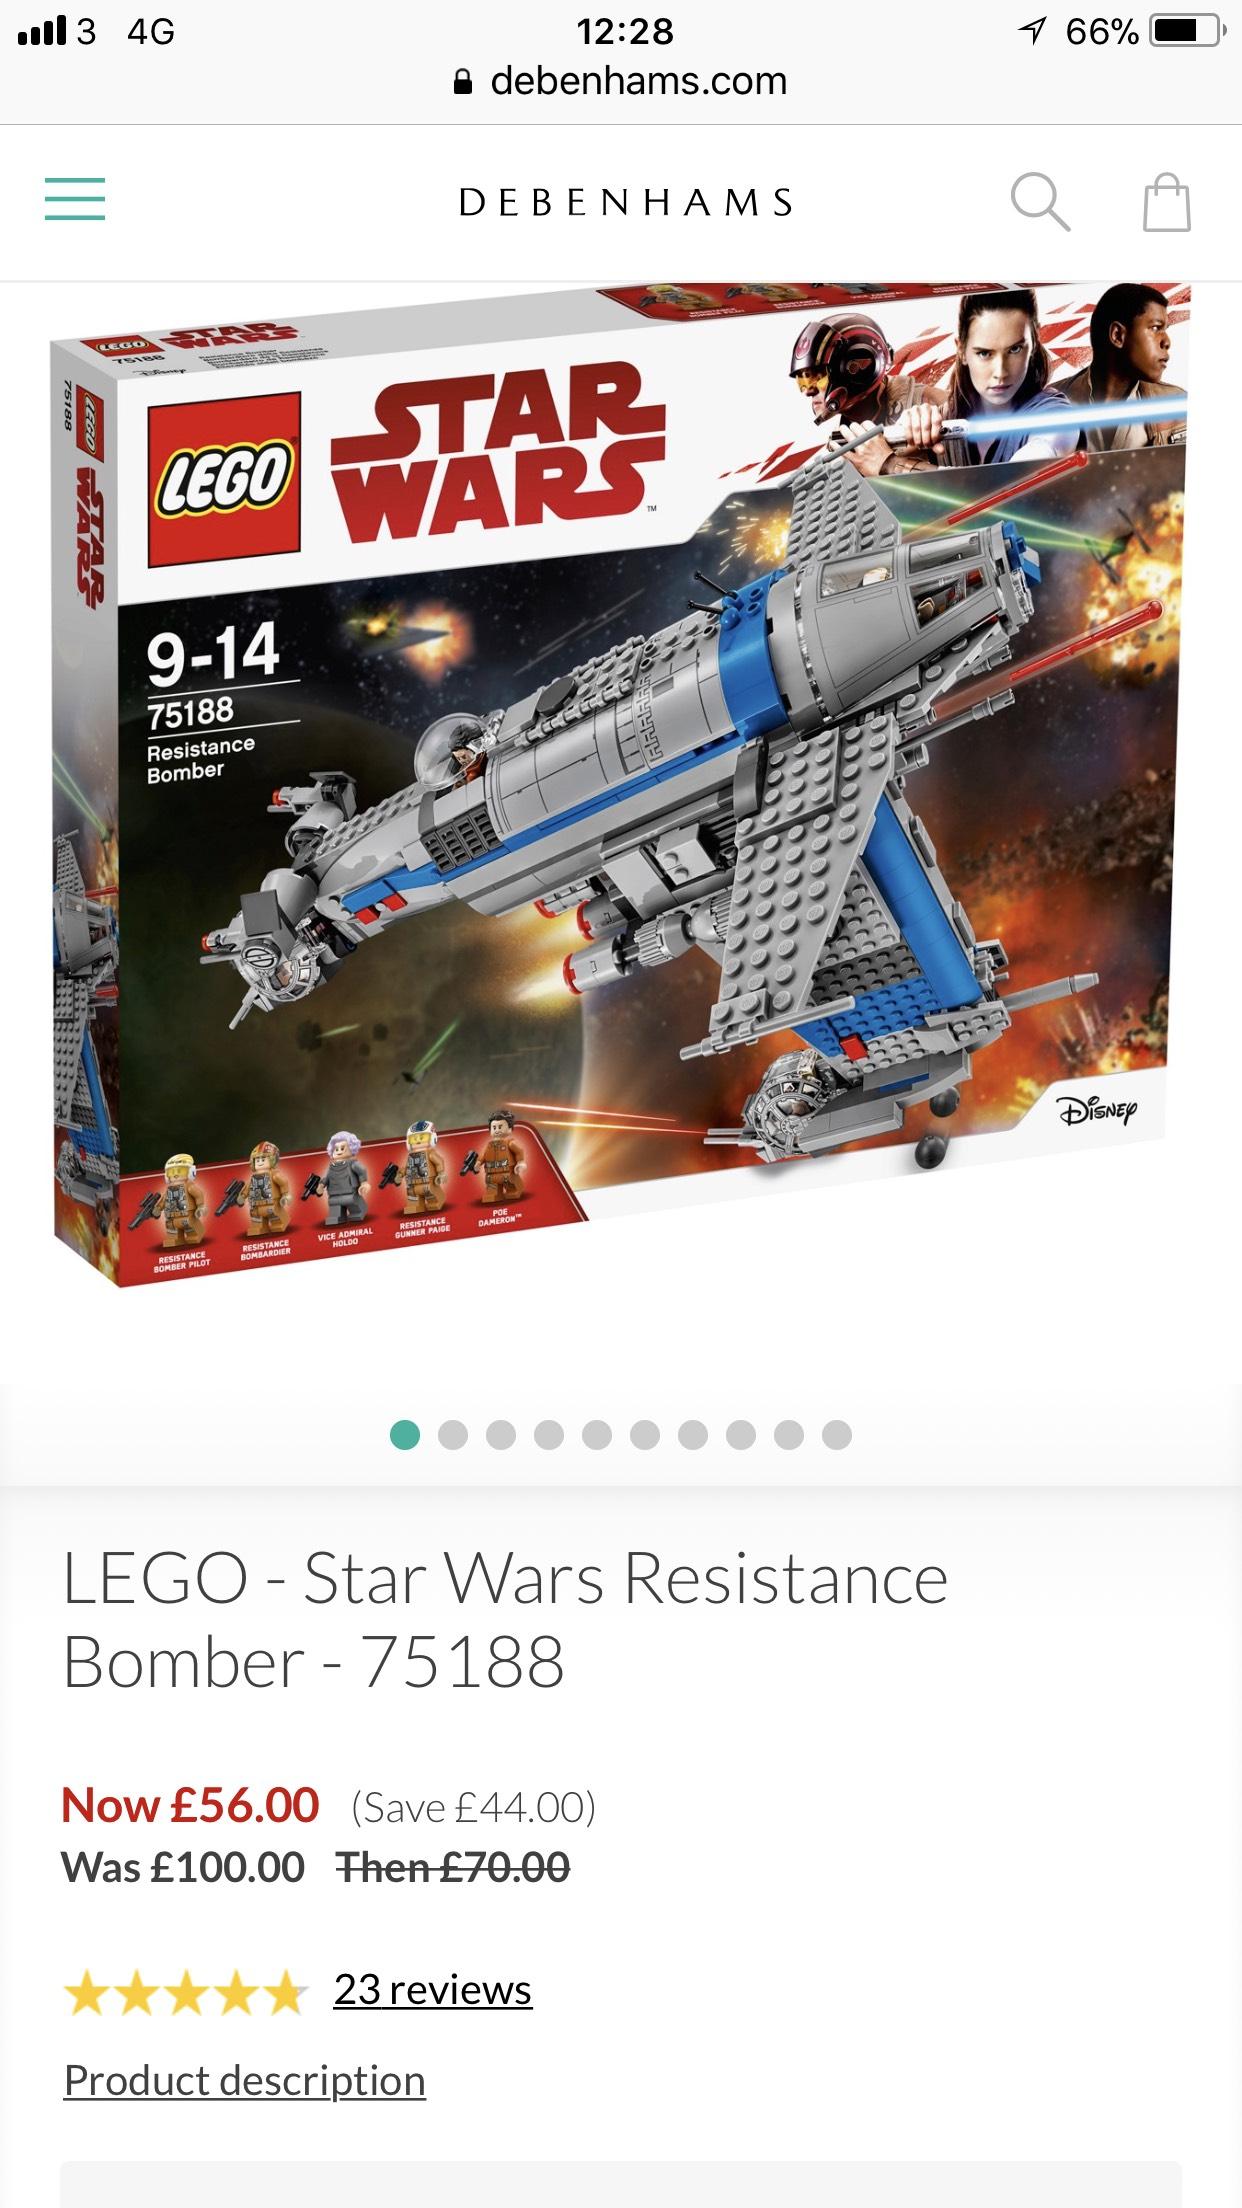 Debenhams Star Wars Lego discount - LEGO - Star Wars Resistance Bomber - 75188 £56 (free c&c)